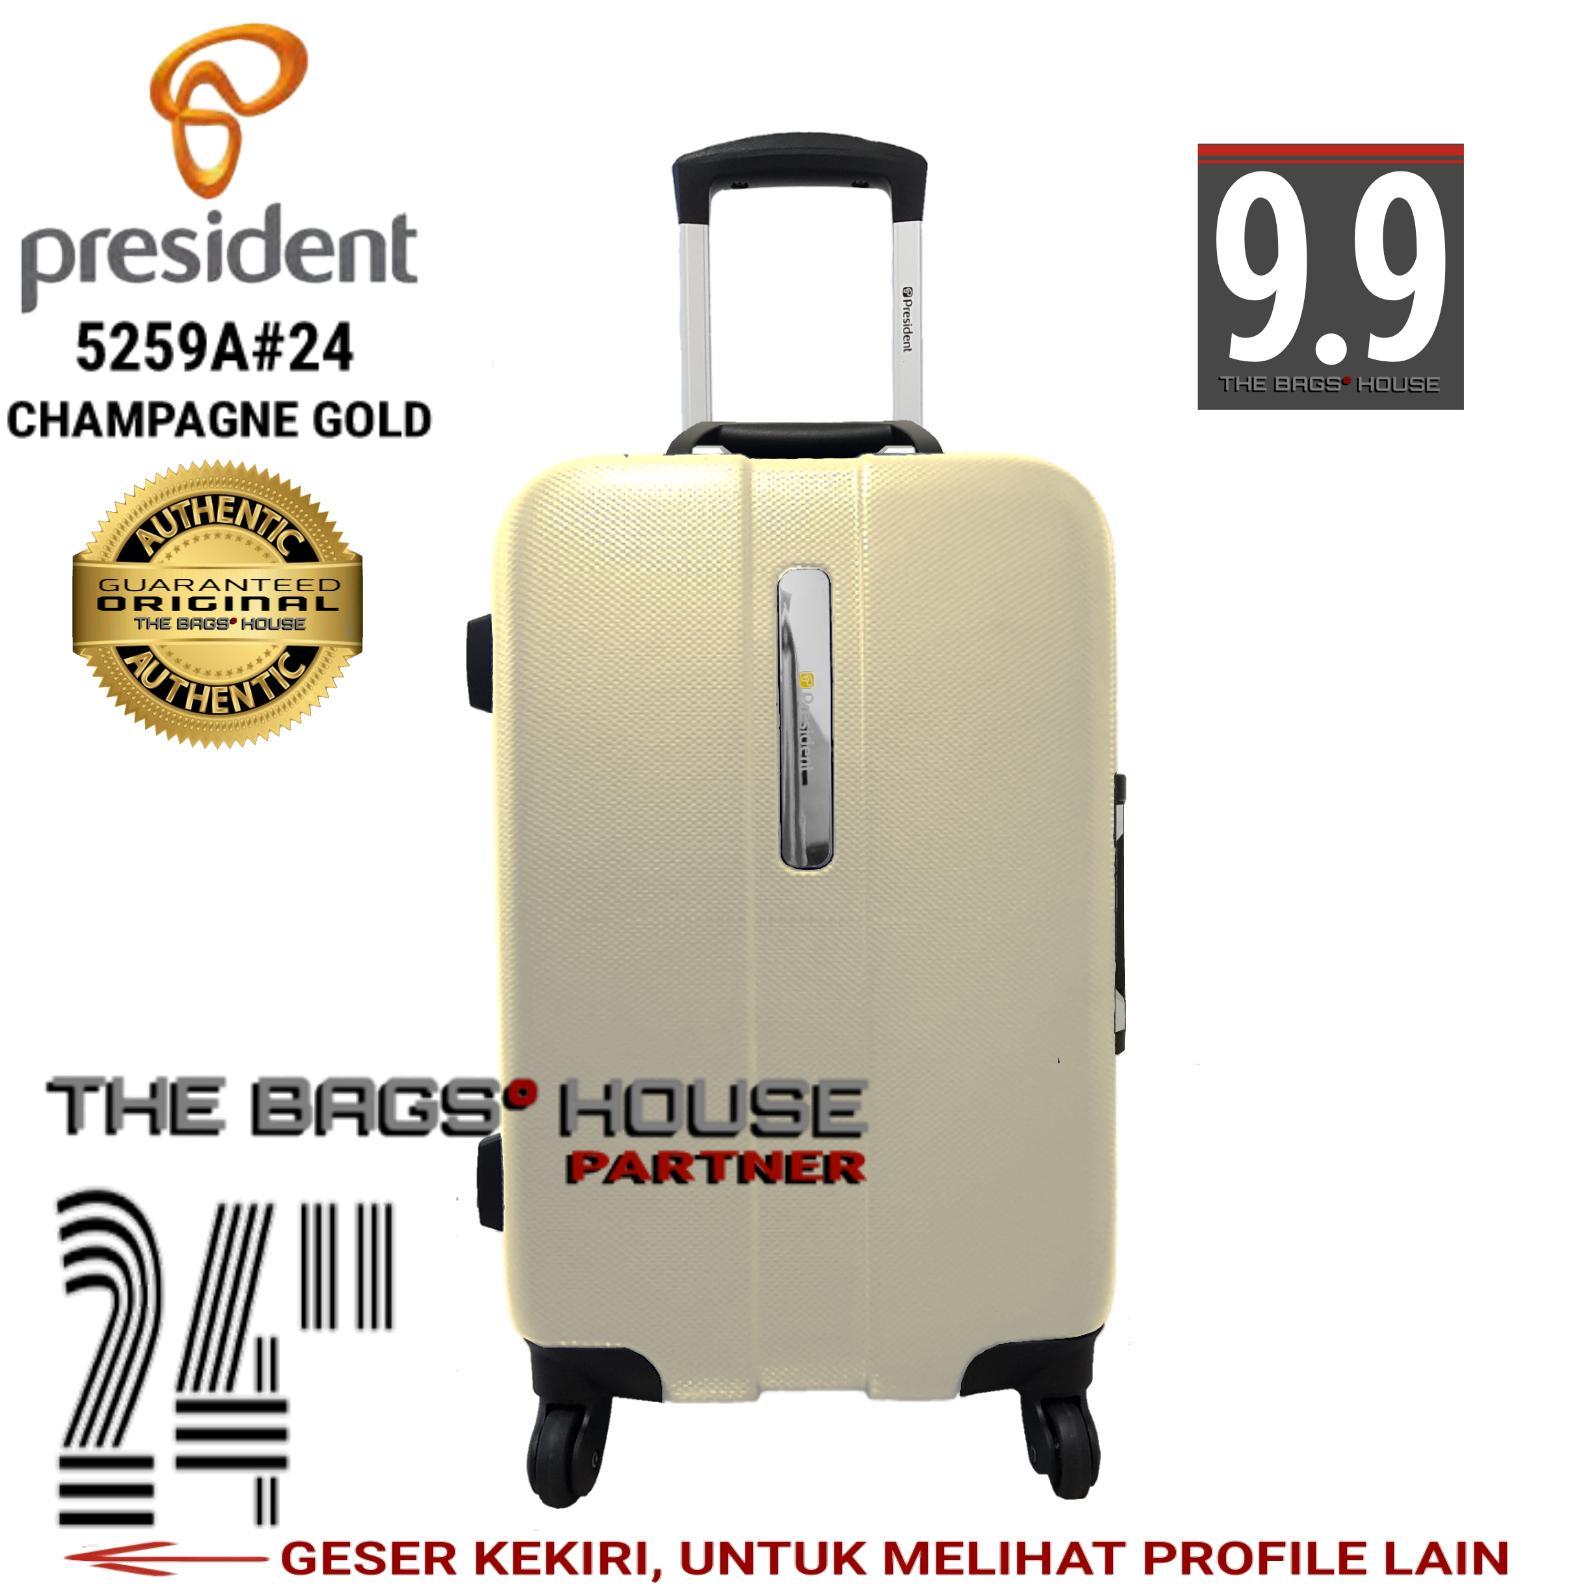 BELIKOPER - PRESIDENT 5259A#24 KOPER HARD CASE 24